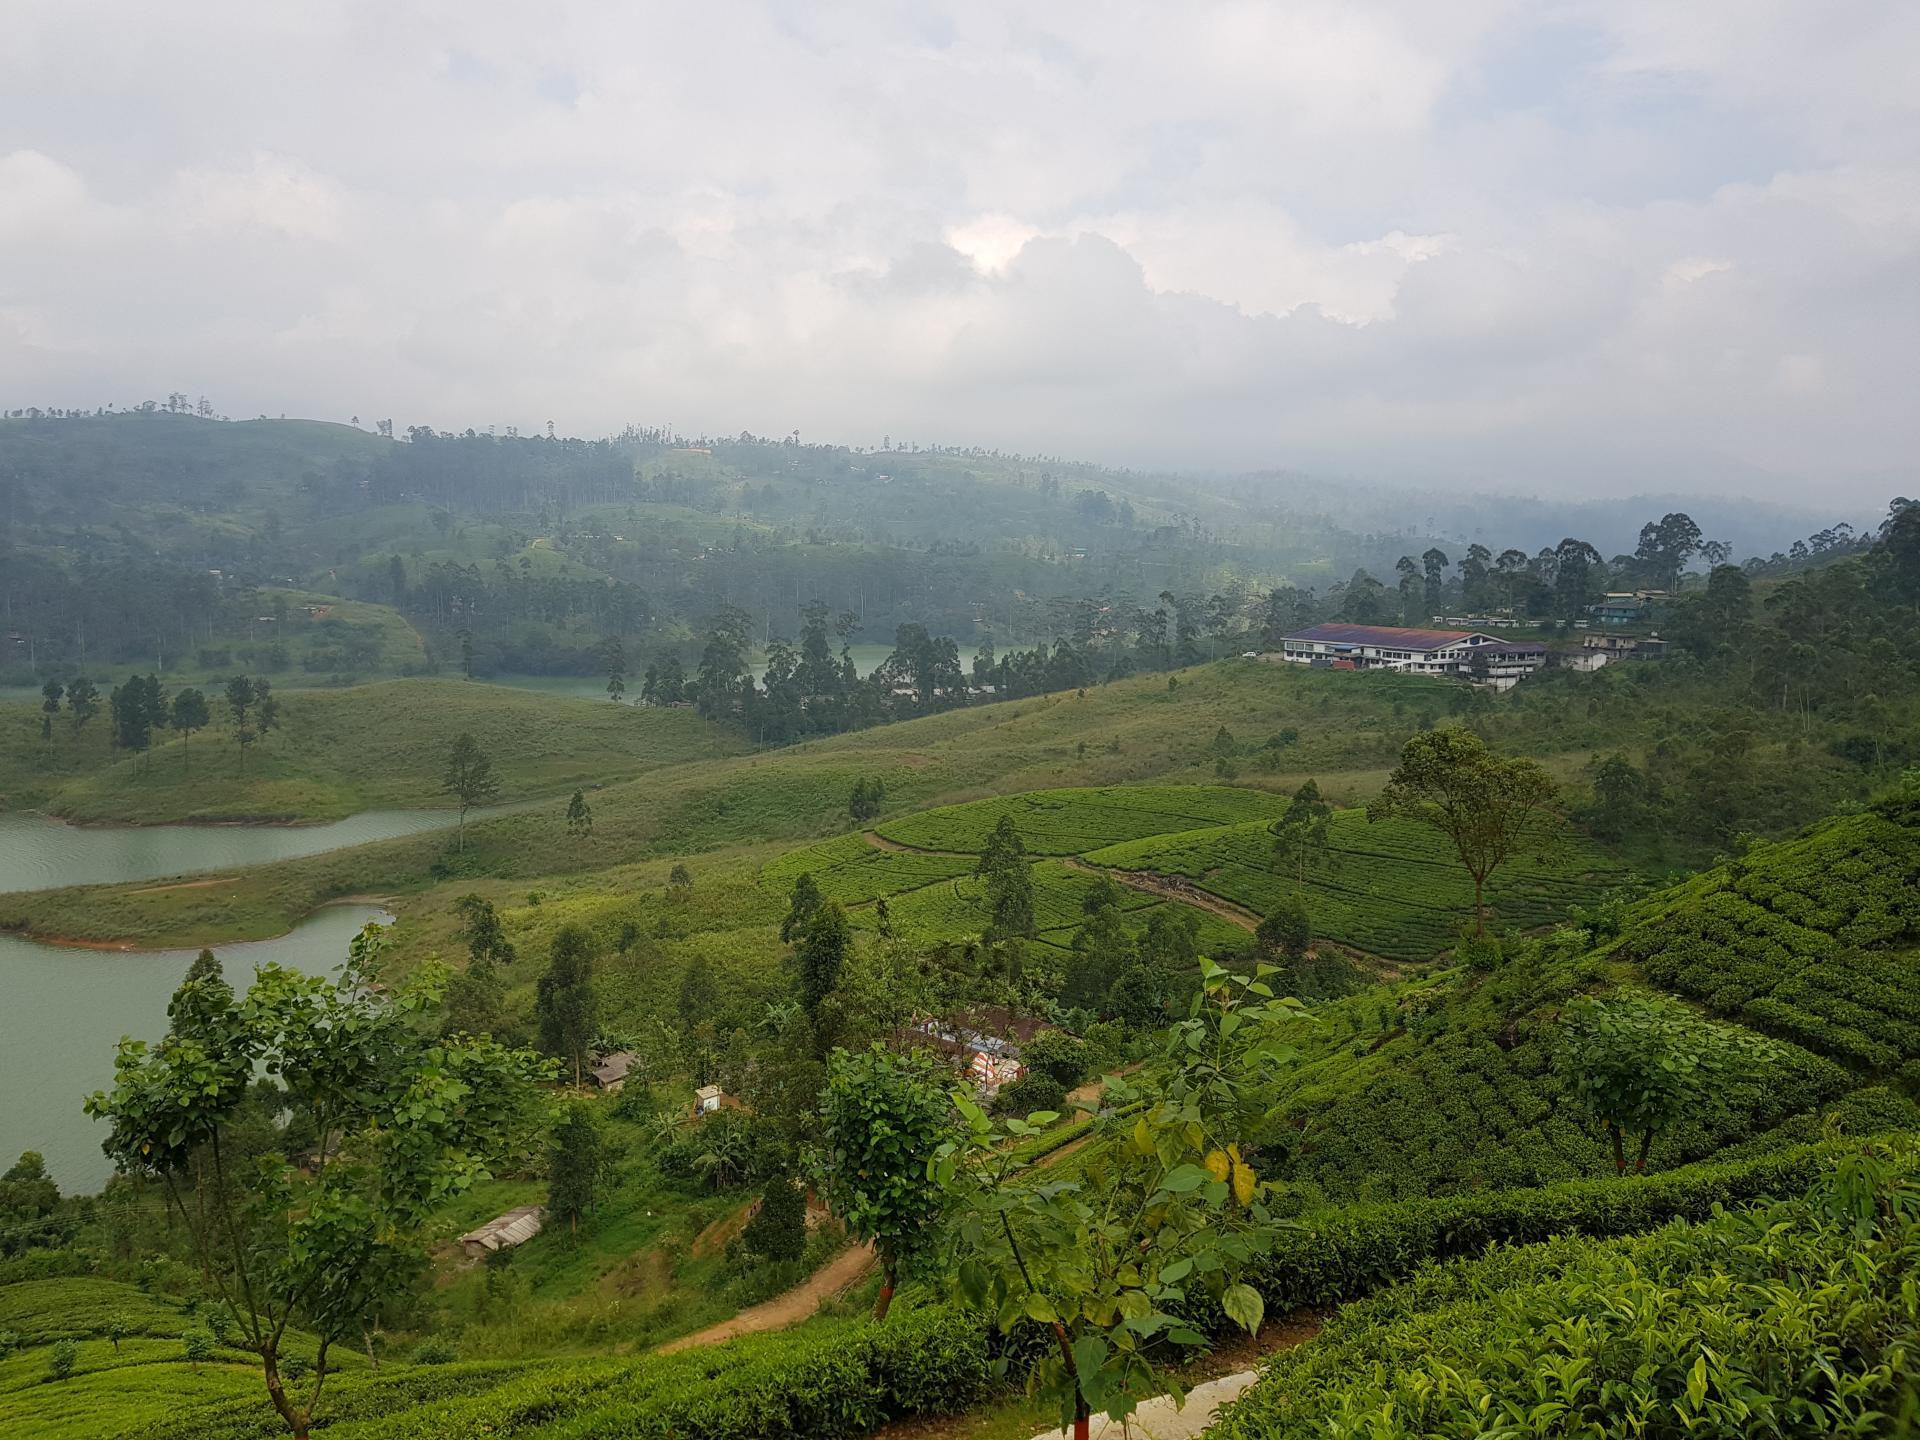 водохранилище Каслри, Хаттон, Шри-Ланка